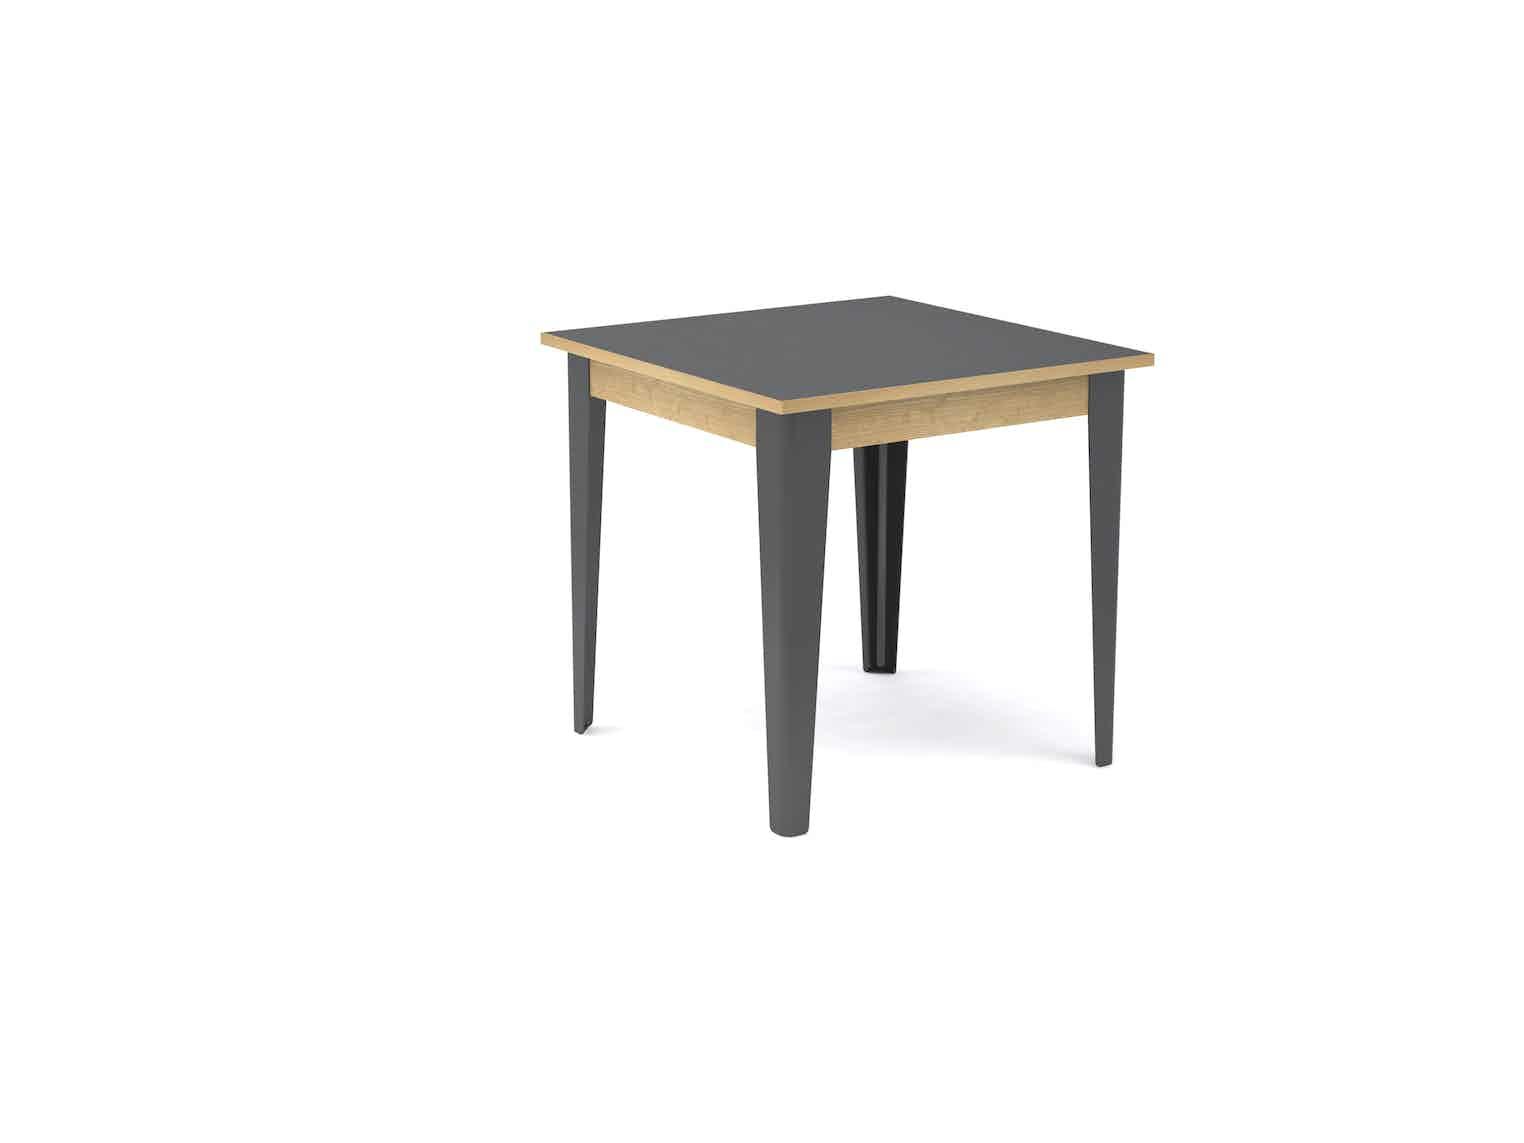 Deadgood-tree-table-square-side-haute-living